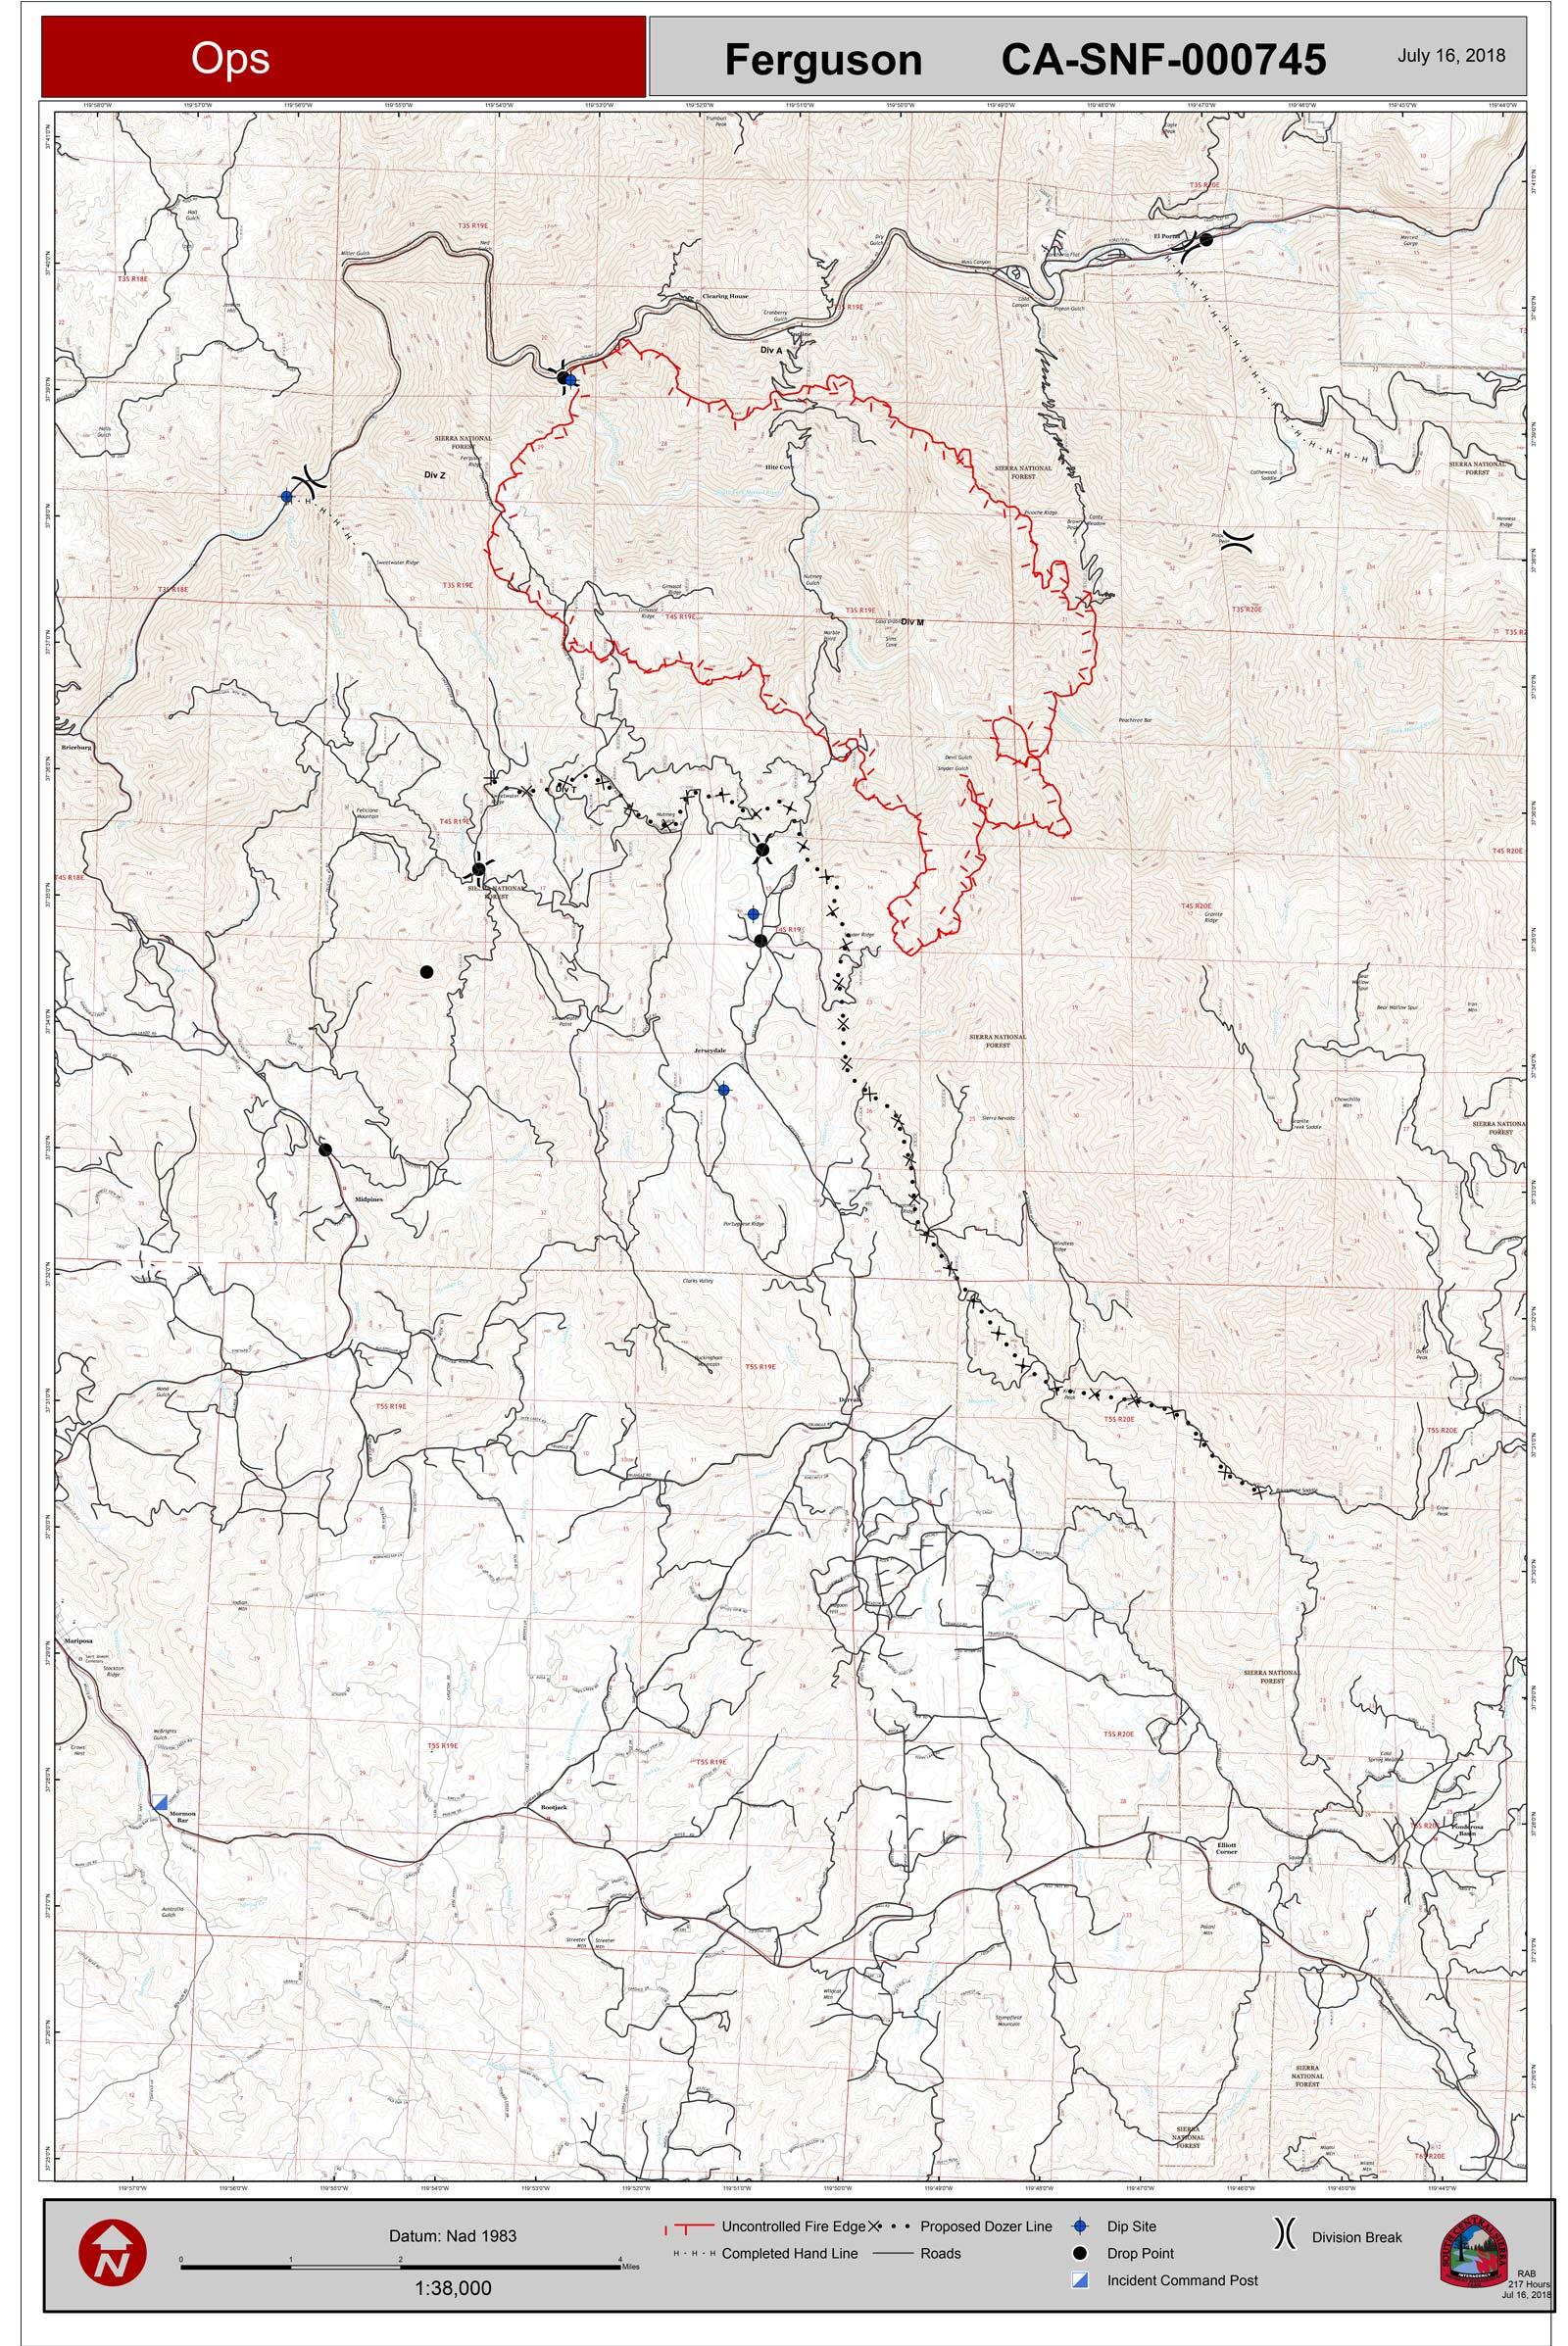 Ferguson Fire California Map.Ferguson Fire Near Yosemite National Park In Mariposa County Monday